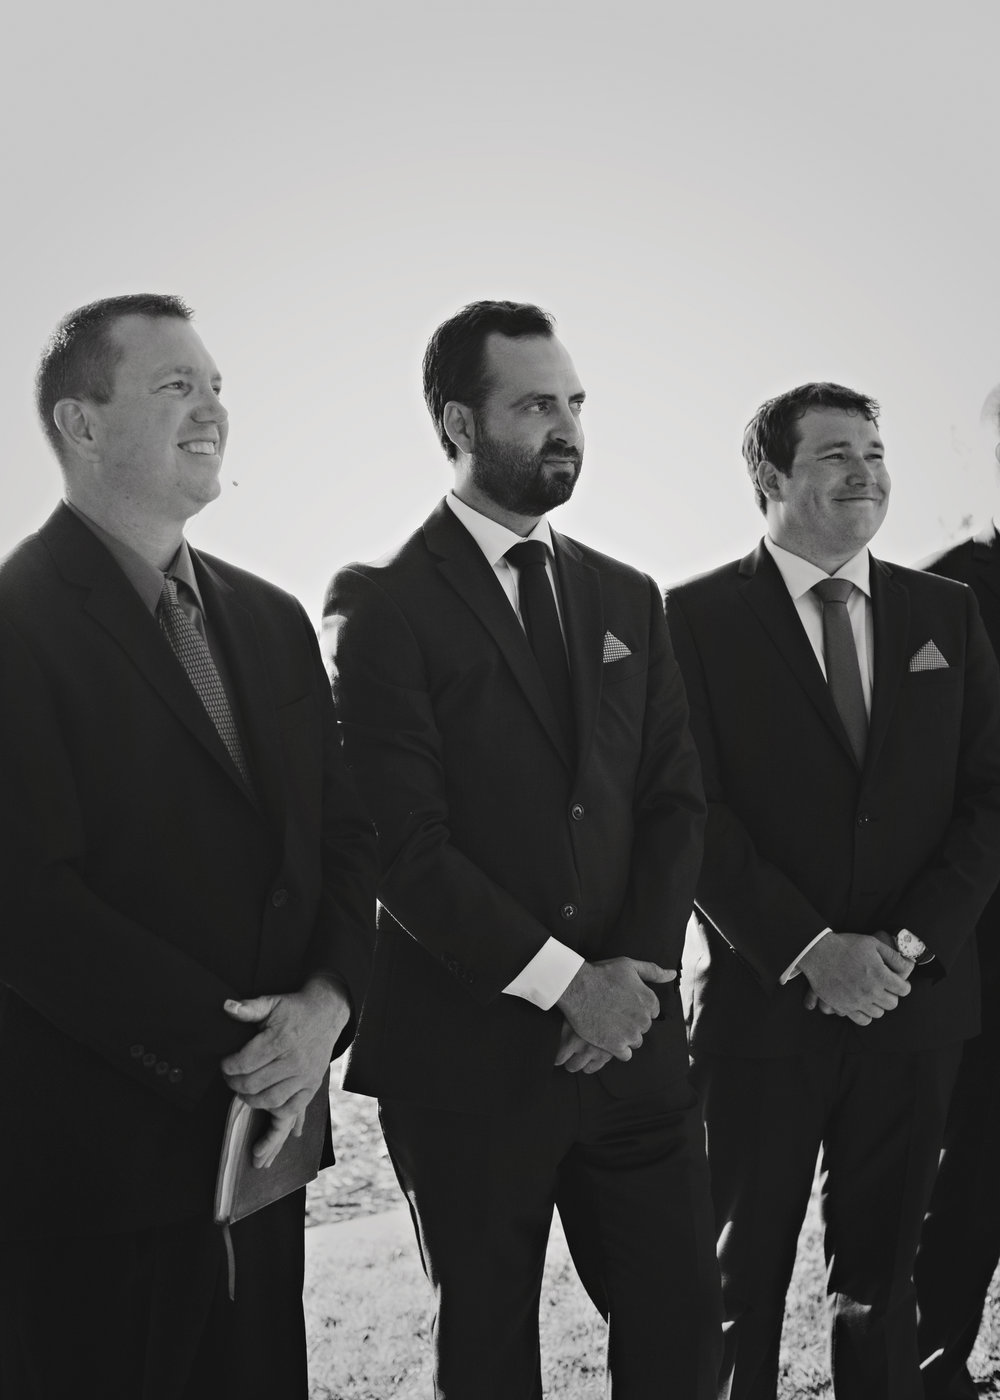 Martin-Johnson-House-Wedding-San-Diego-Wedding-Photographer-La-Jolla_029.JPG